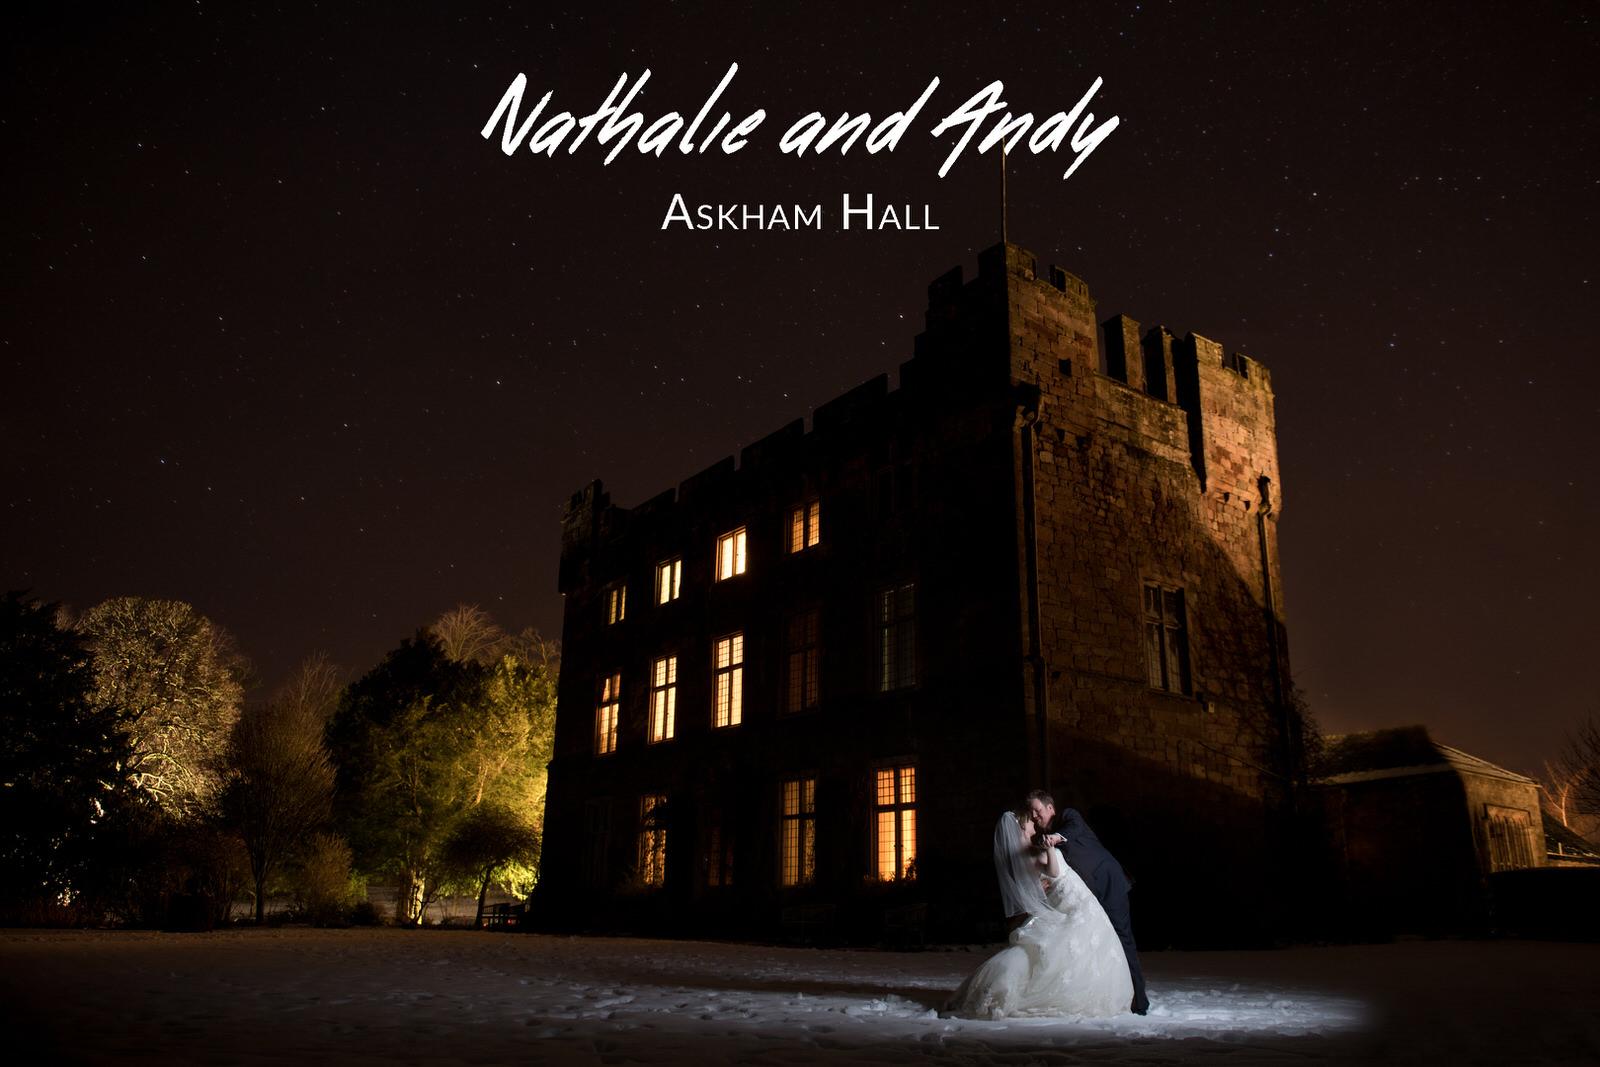 Nathalie and Andy's Wedding - Askham Hall